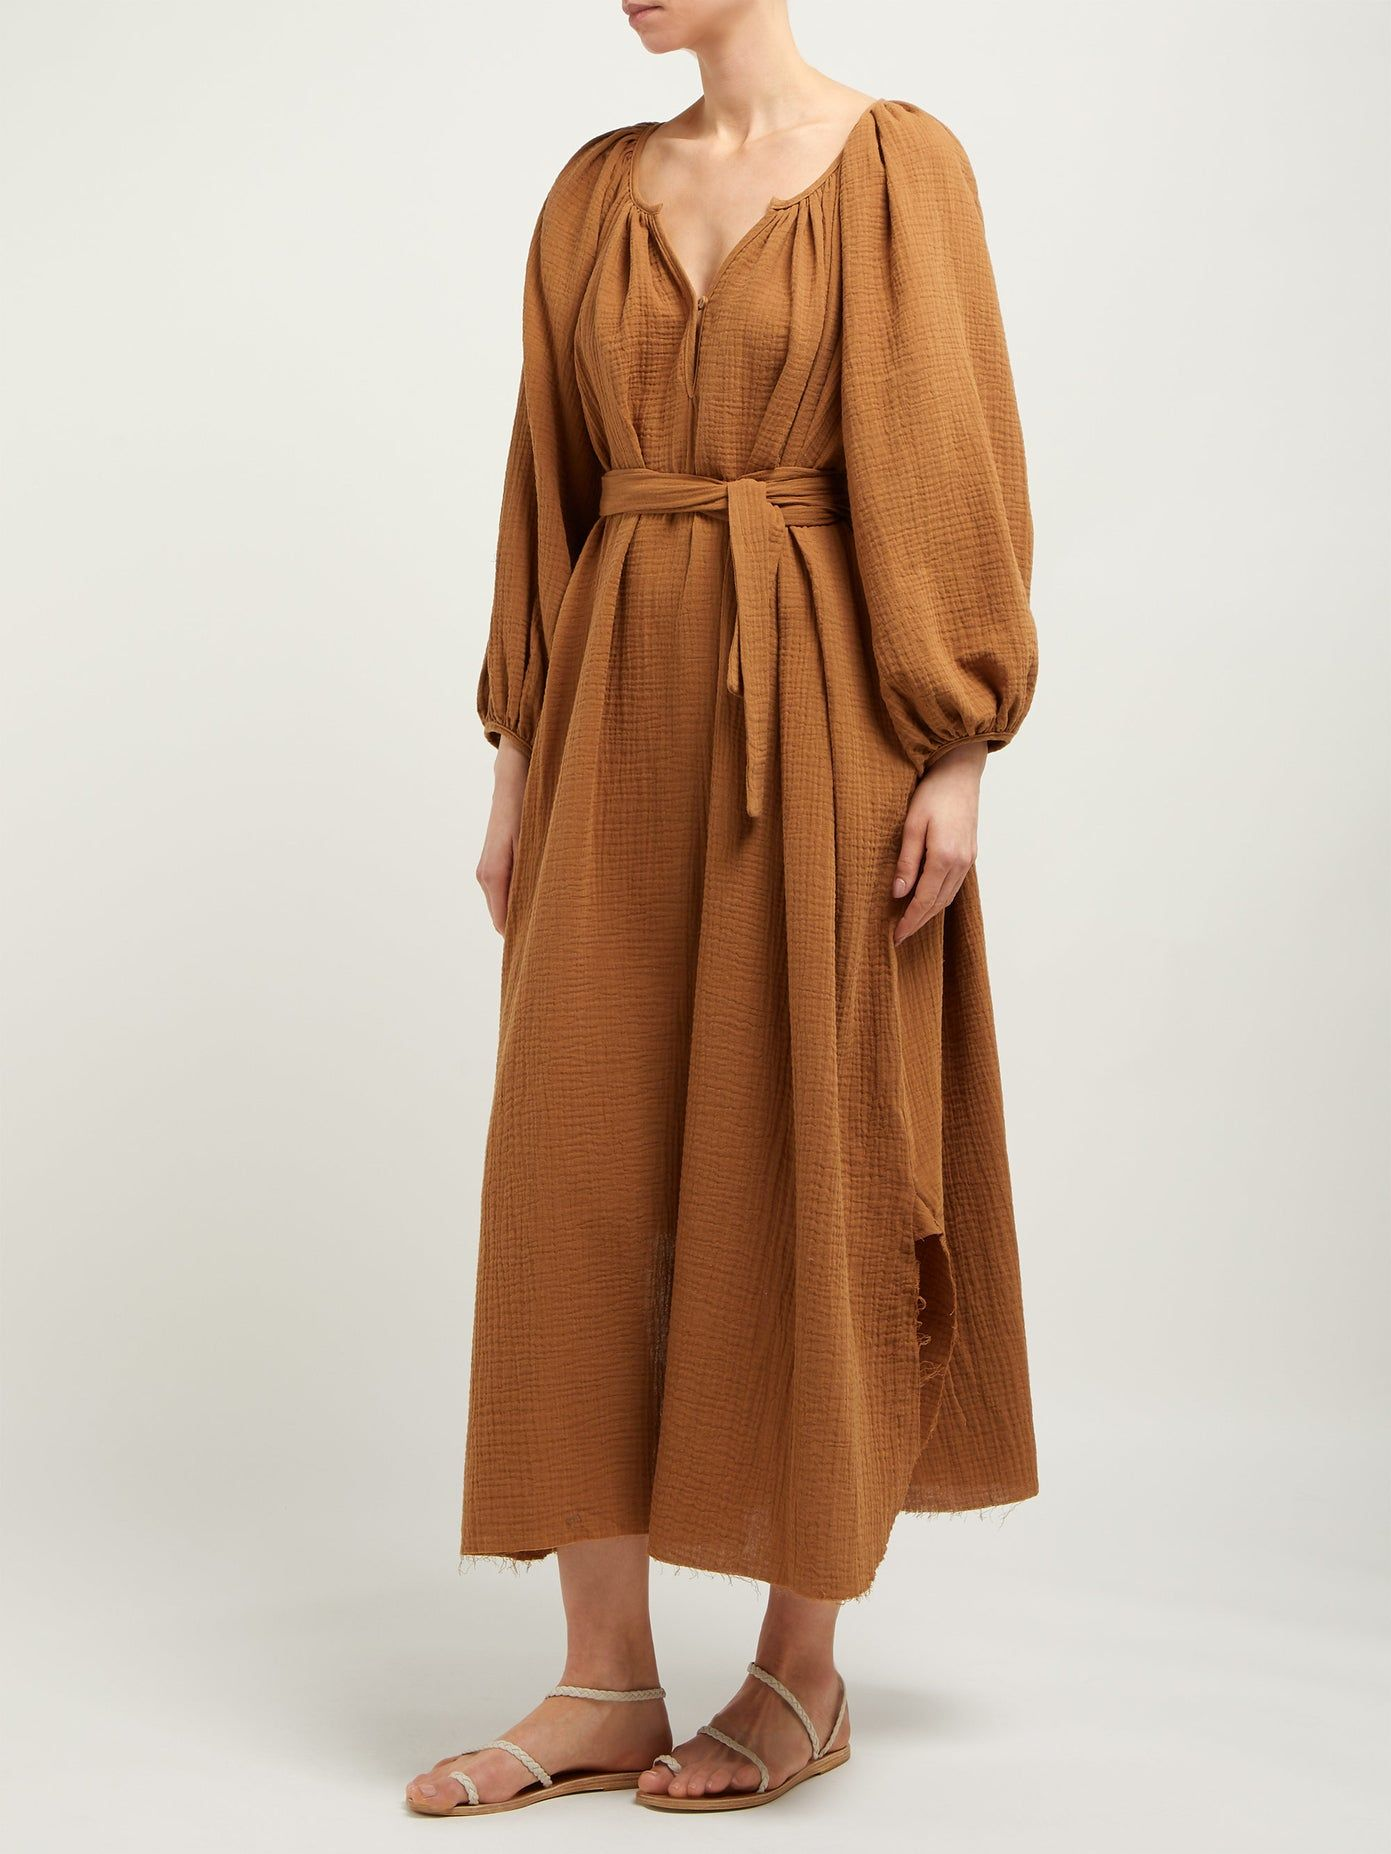 Organic Cotton Gauze Midi Dress Loup Charmant Matchesfashion Uk Gauze Dress Cotton Gauze Dress Modest Dresses [ 1854 x 1391 Pixel ]